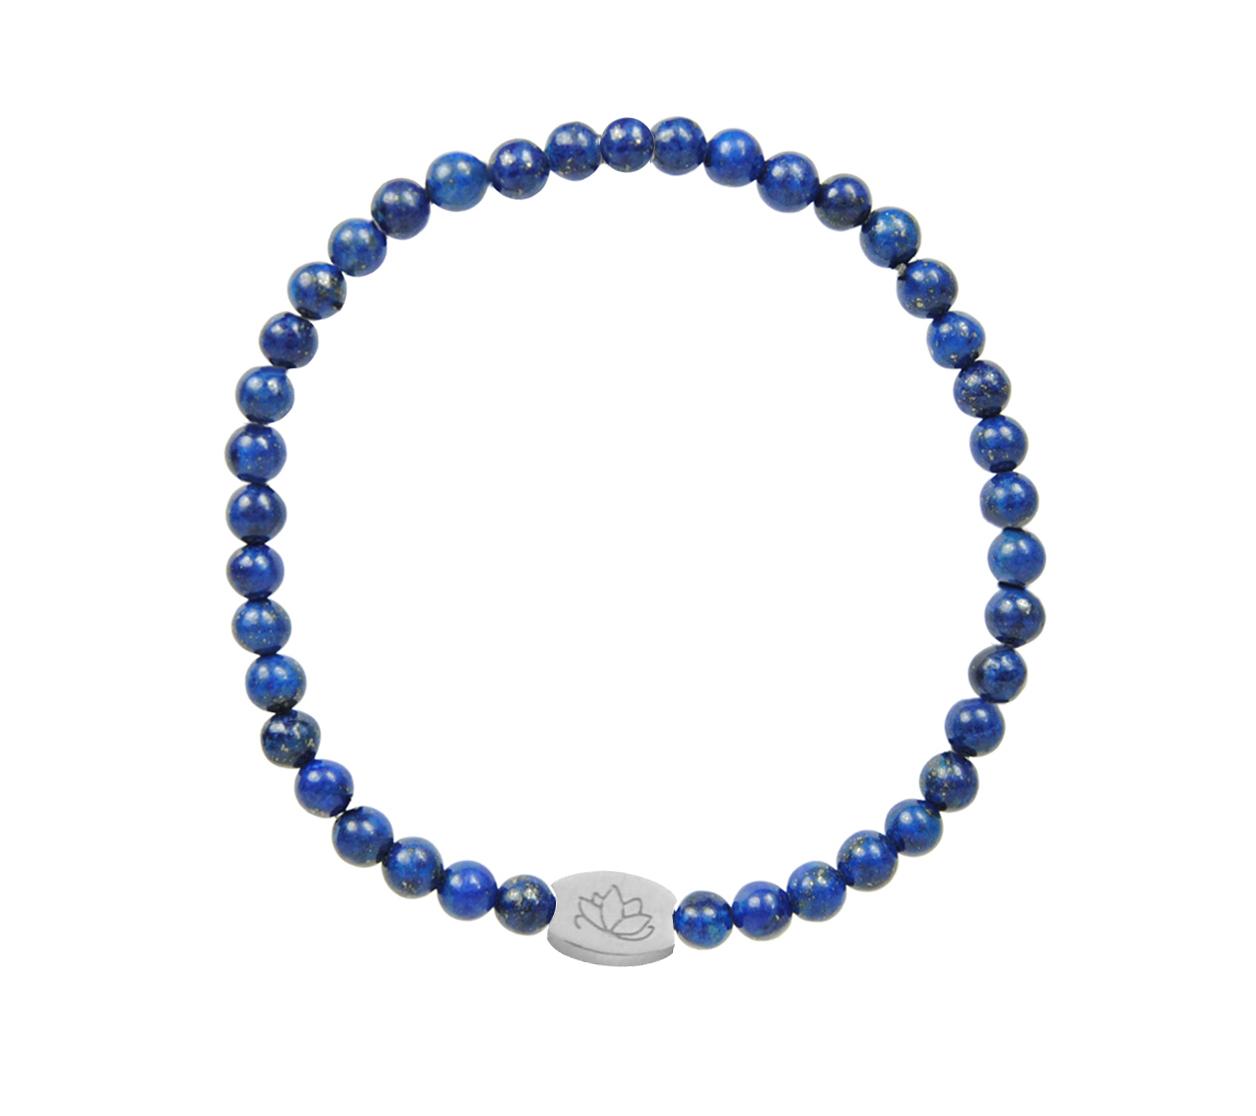 Armbaender für Frauen - MAS jewelz Armband Lapis Lazuli 4mm  - Onlineshop Tante Emmer